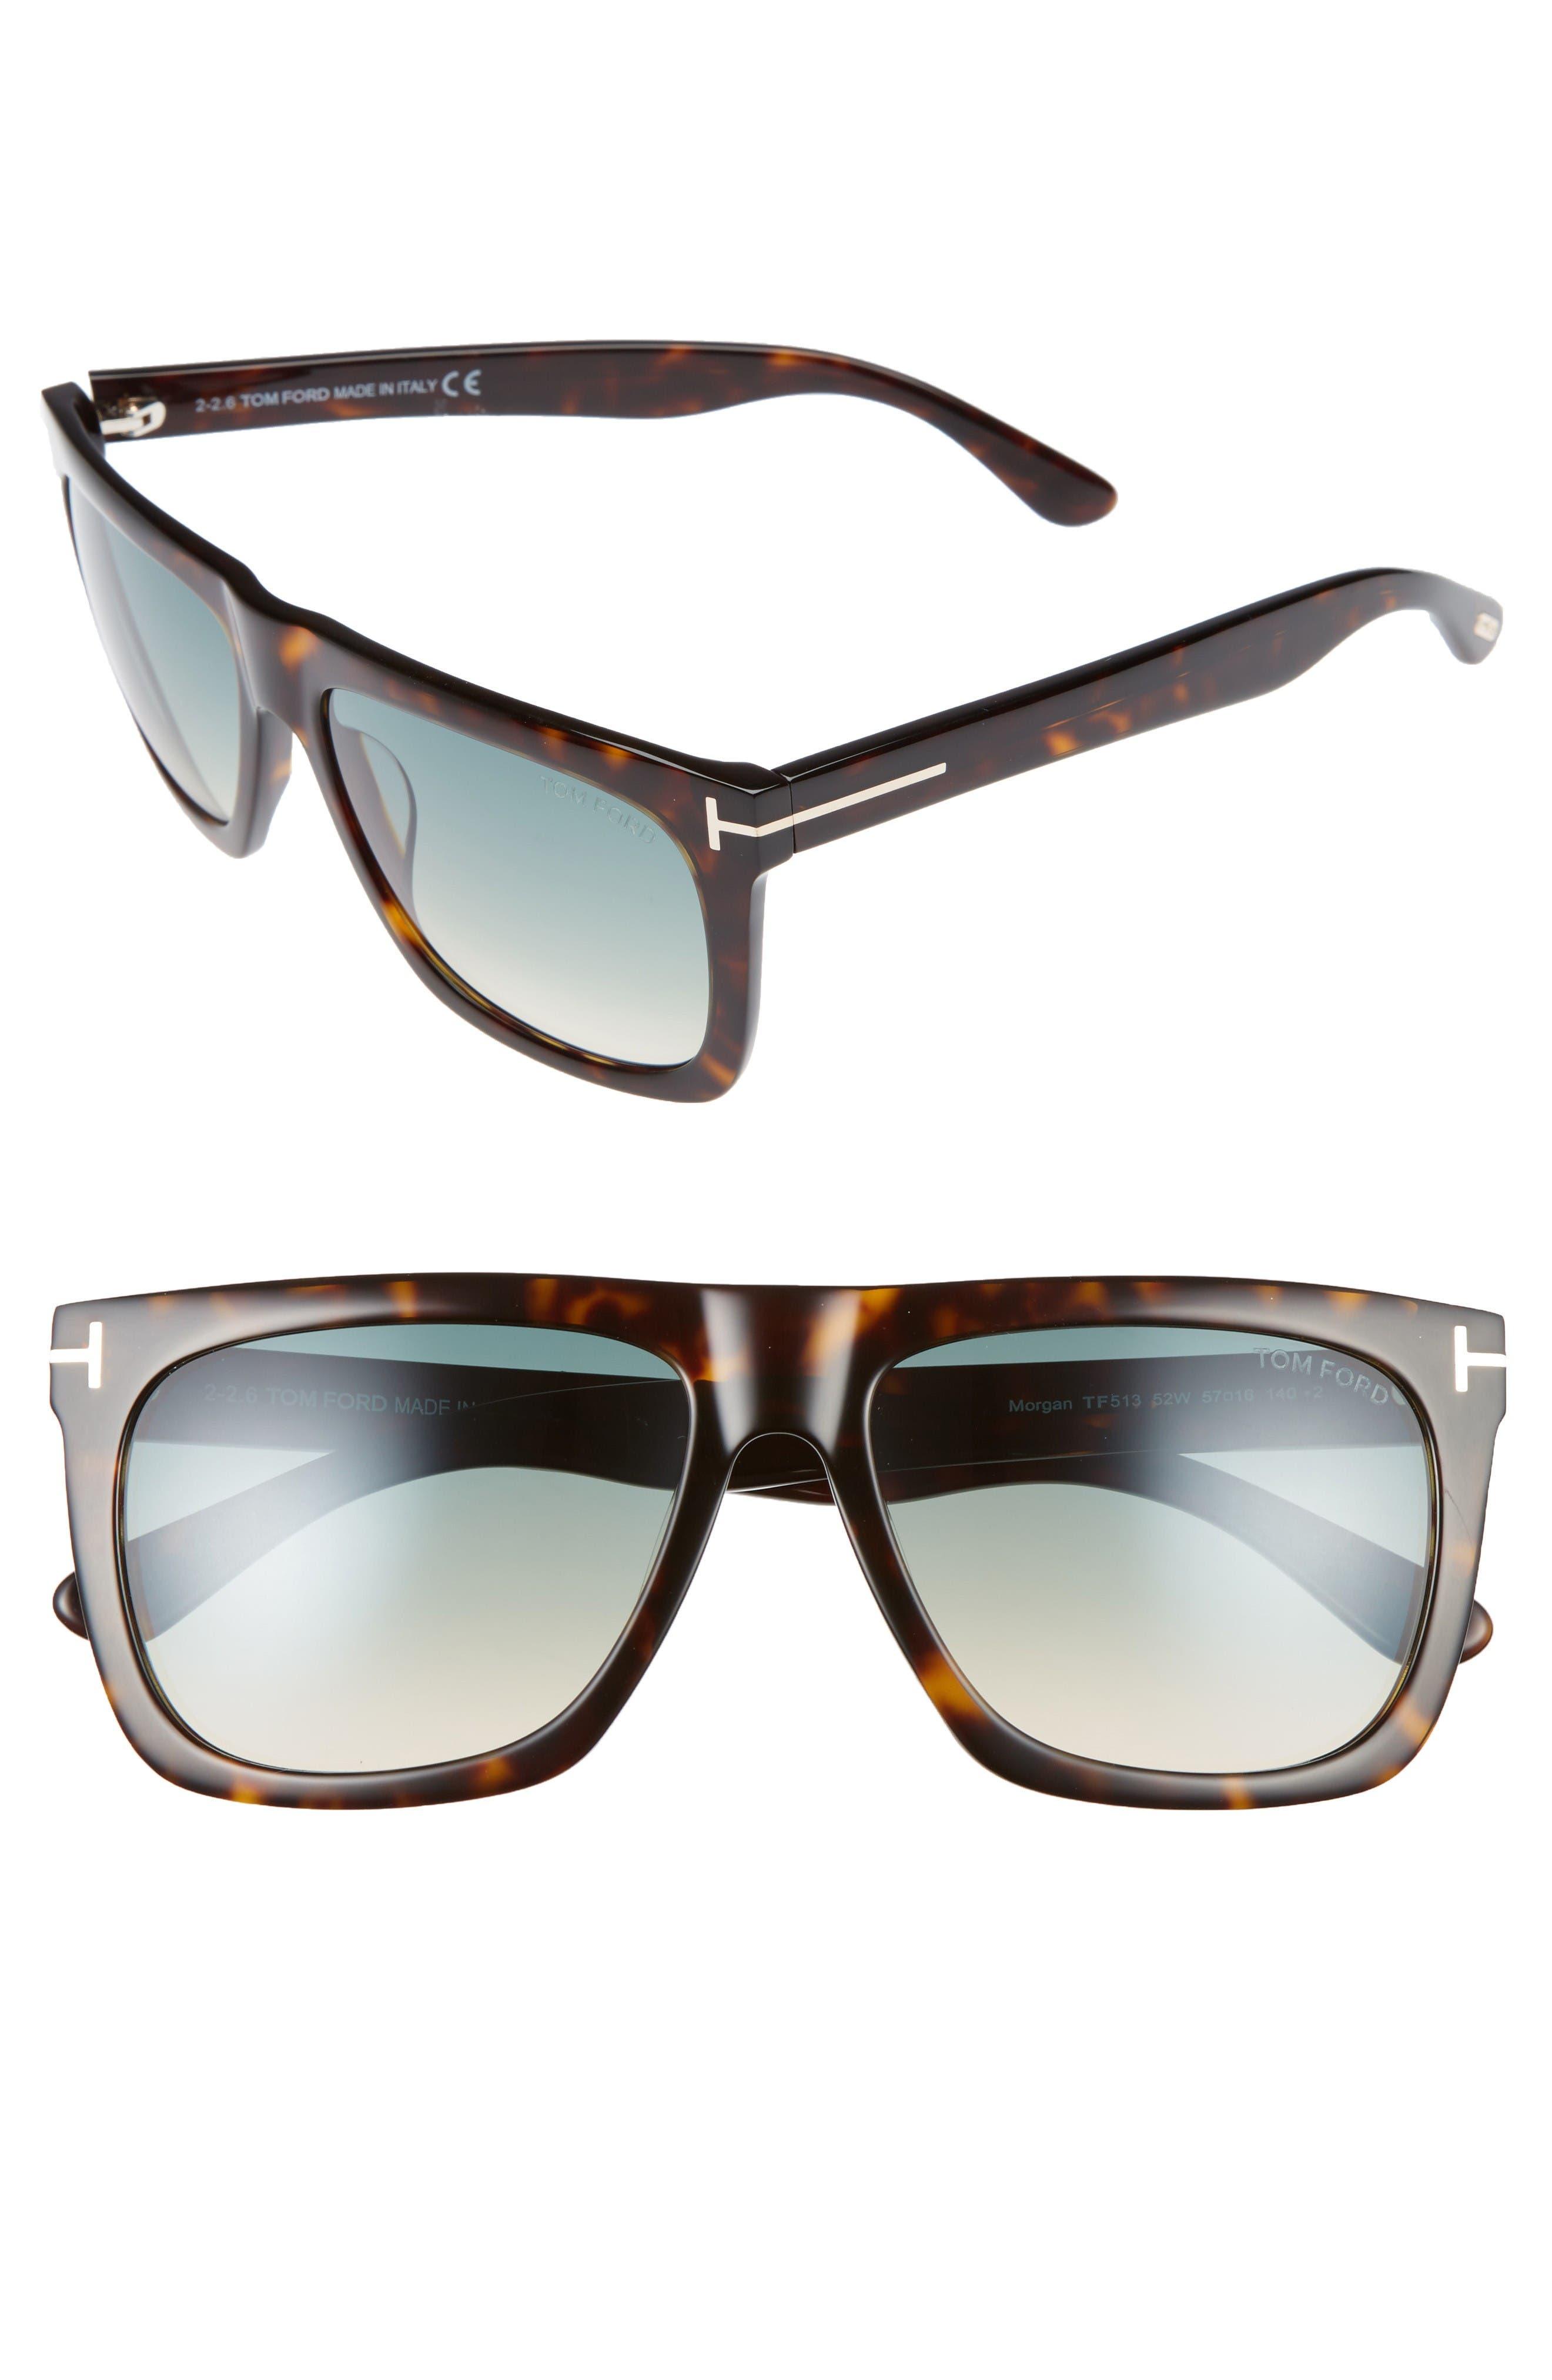 Morgan 57mm Sunglasses,                         Main,                         color, Dark Havana / Gradient Blue